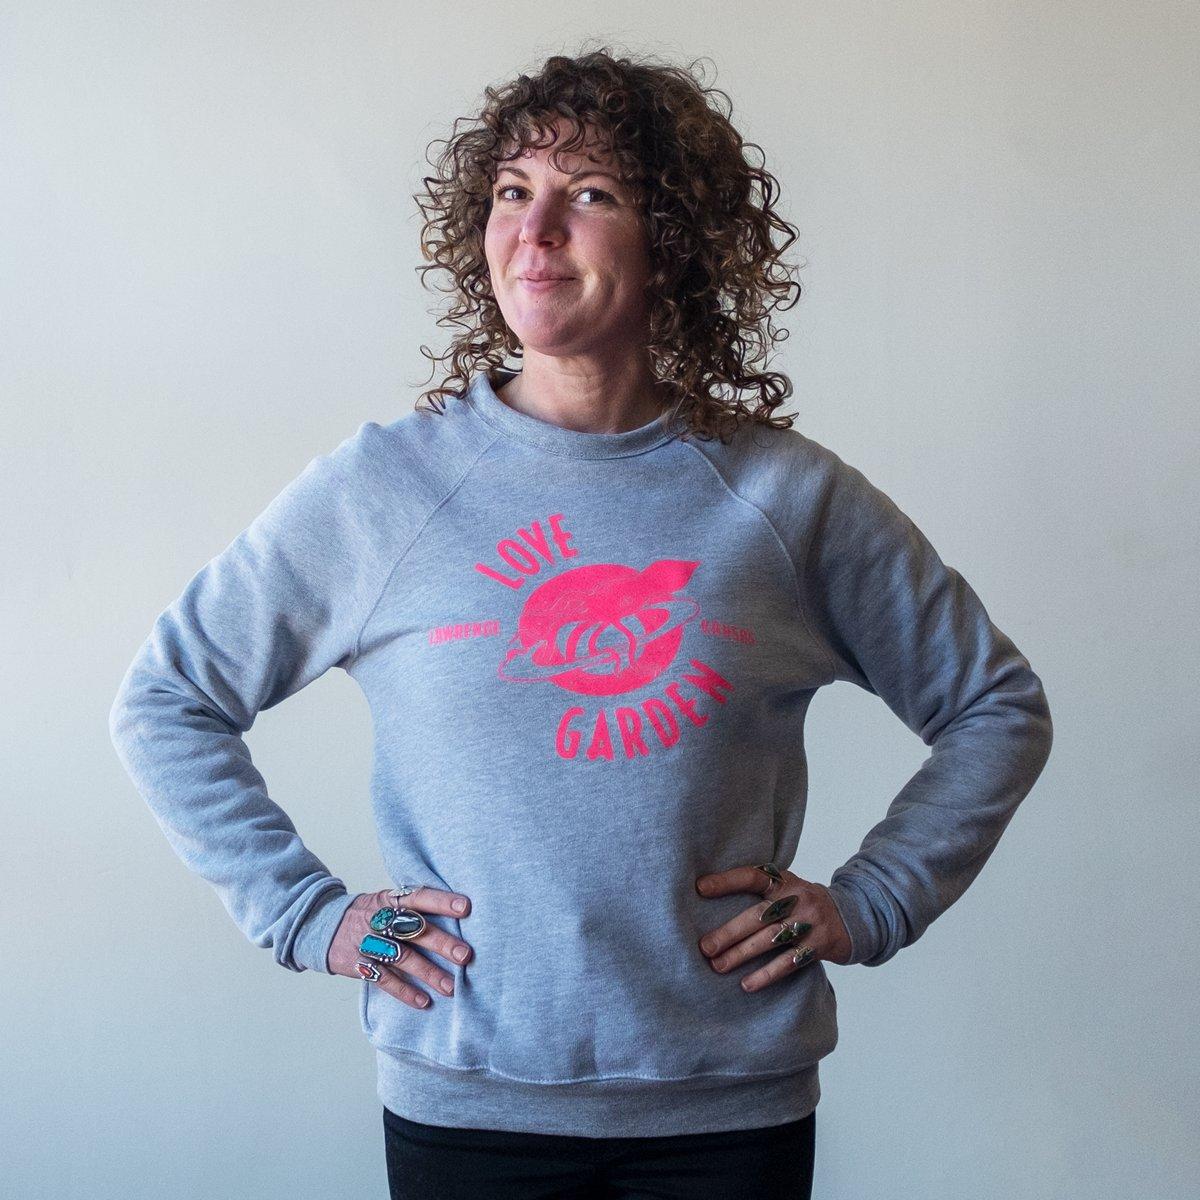 Image of Crew-Neck Sweatshirt